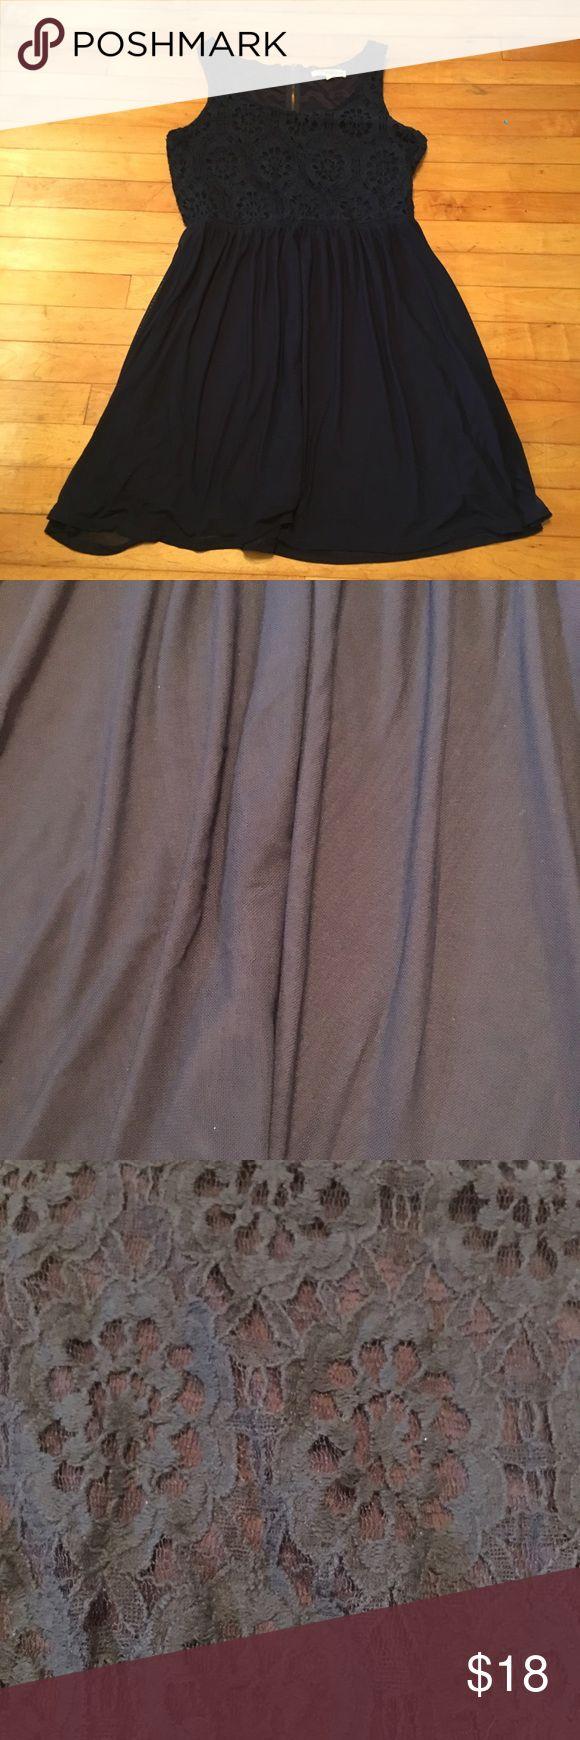 Navy Lace Top Mini Dress Lace top navy mini dress with soft  chiffon skirt, zipper on slight racerback. Some stretch. Juniors XL, runs small. Rewind Dresses Mini